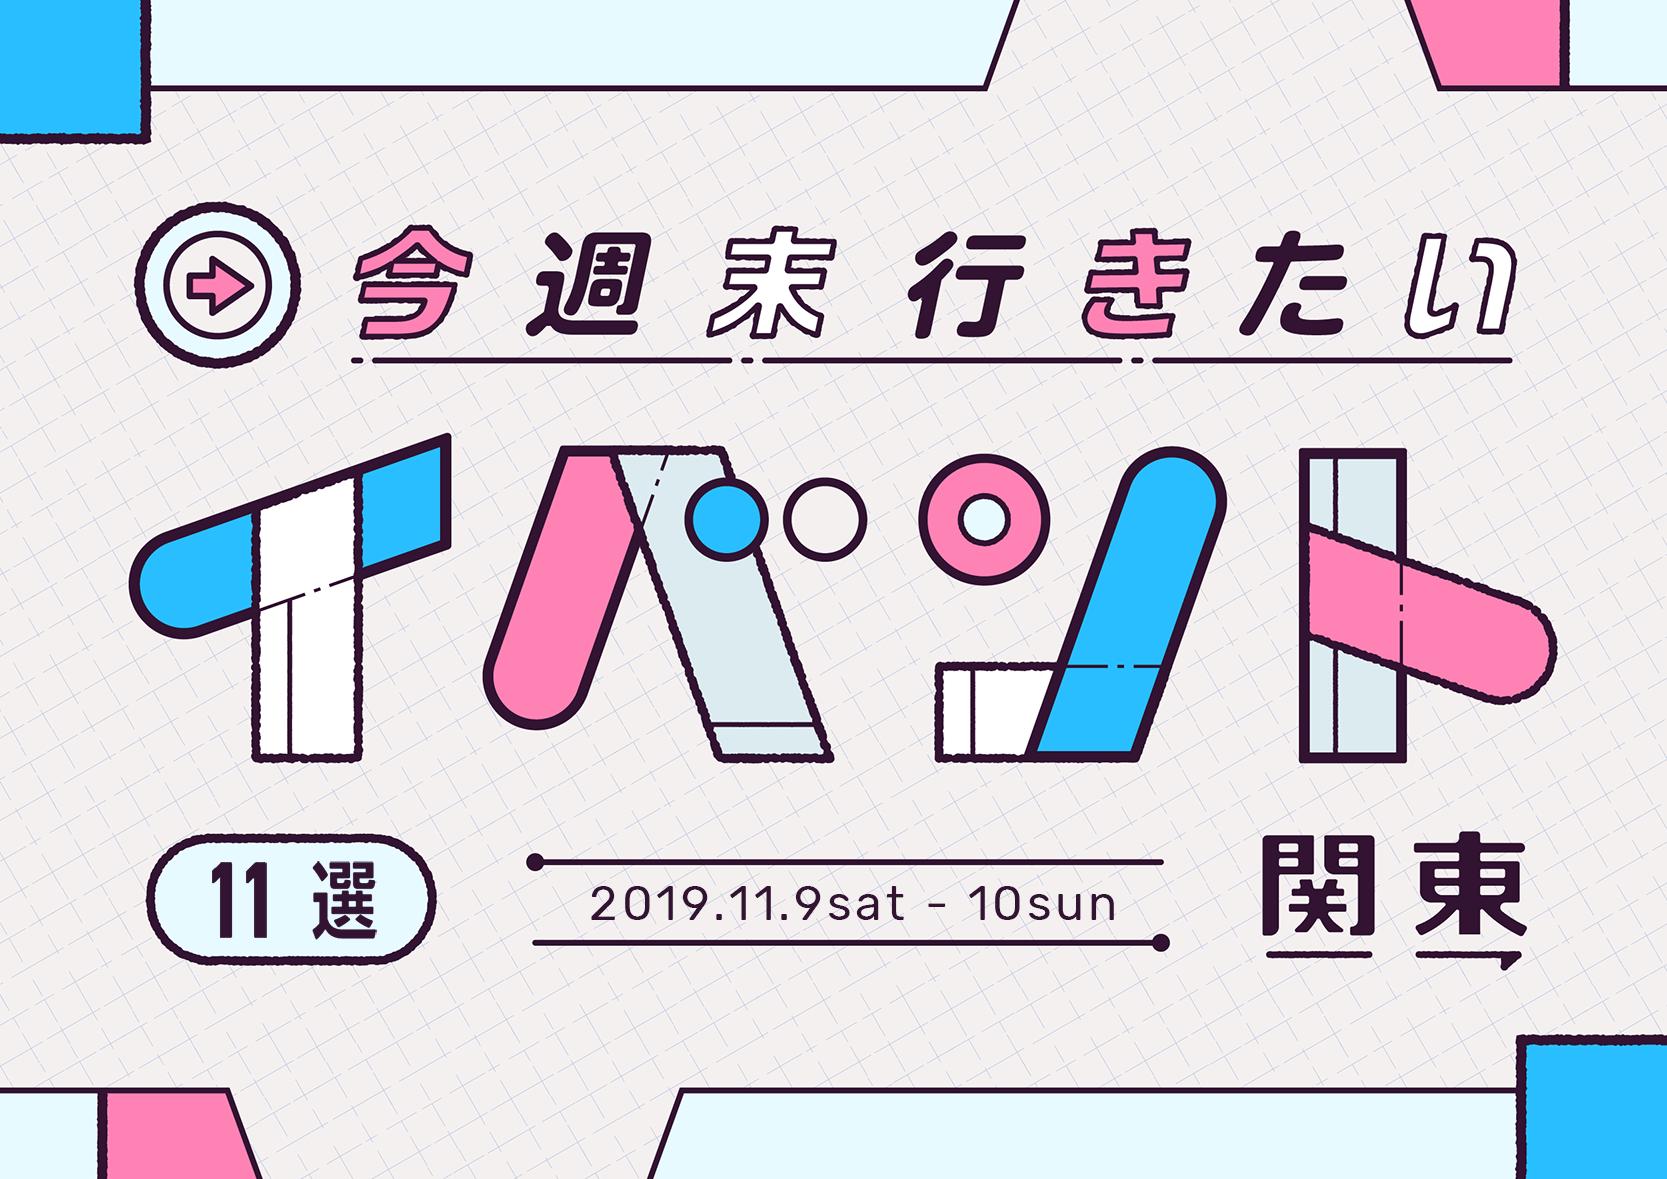 haconiwa「今週末行きたいイベント」メインビジュアル